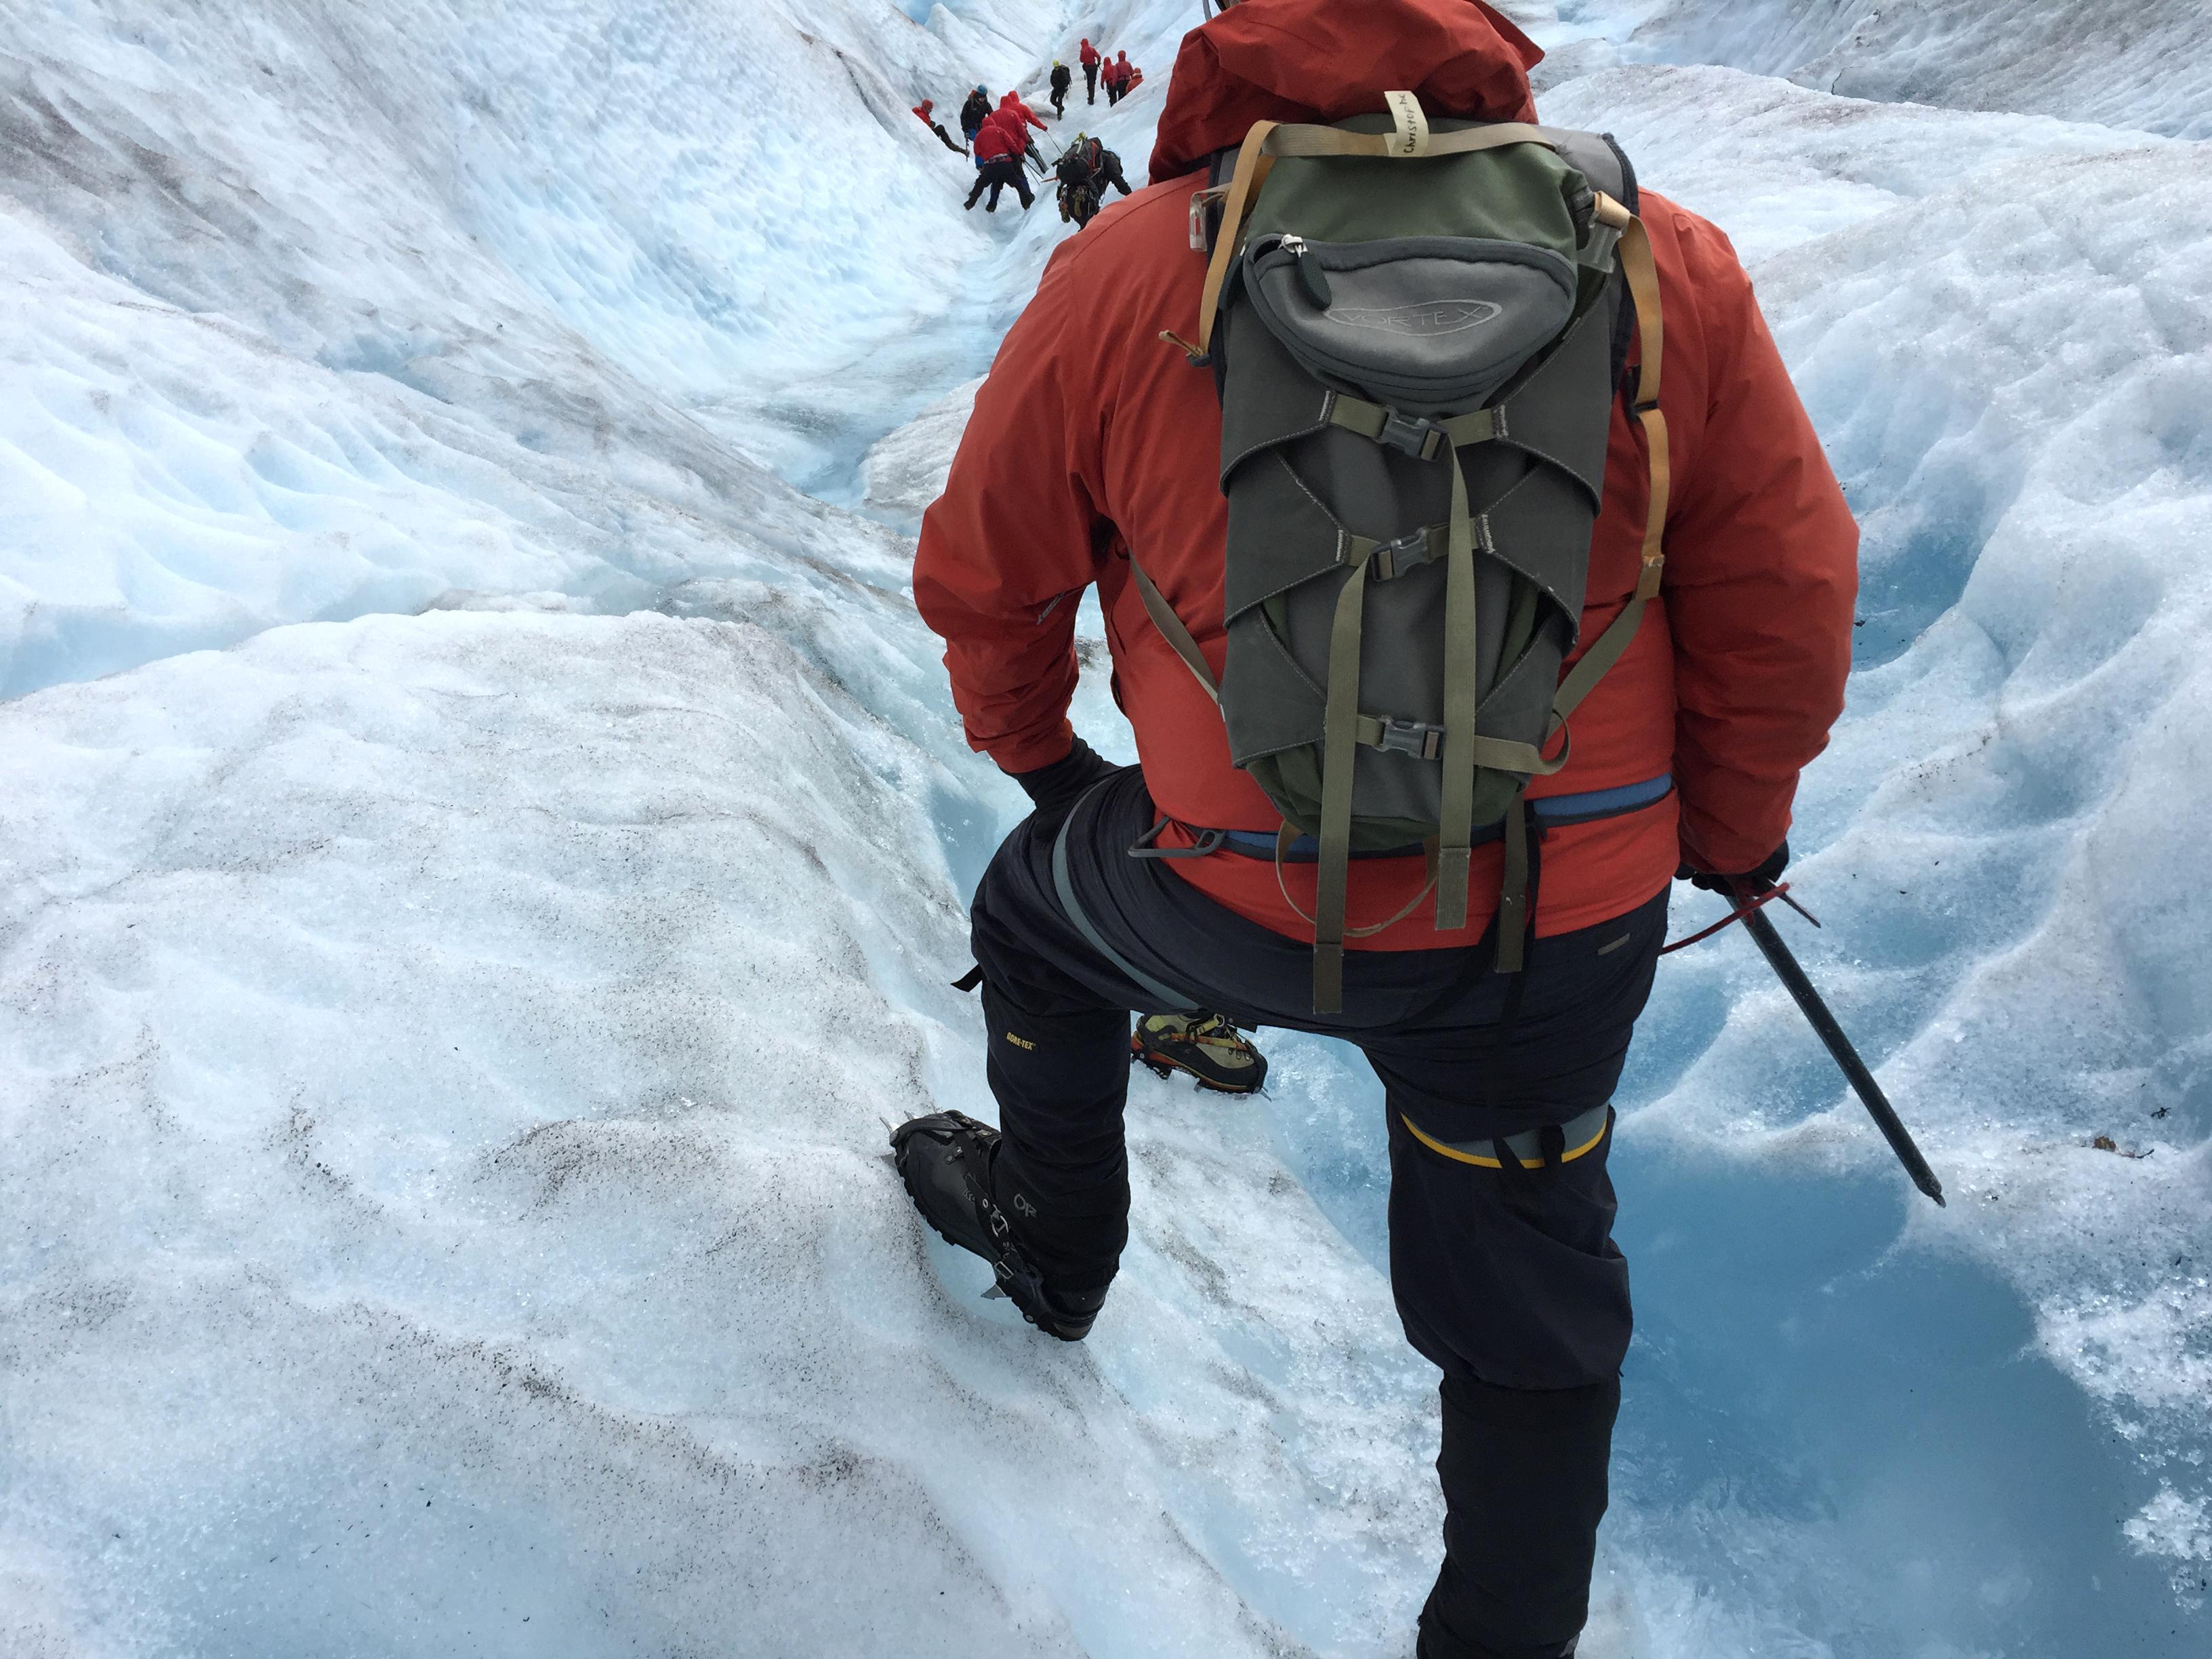 Juneau Icefield in Alaska, Glacier